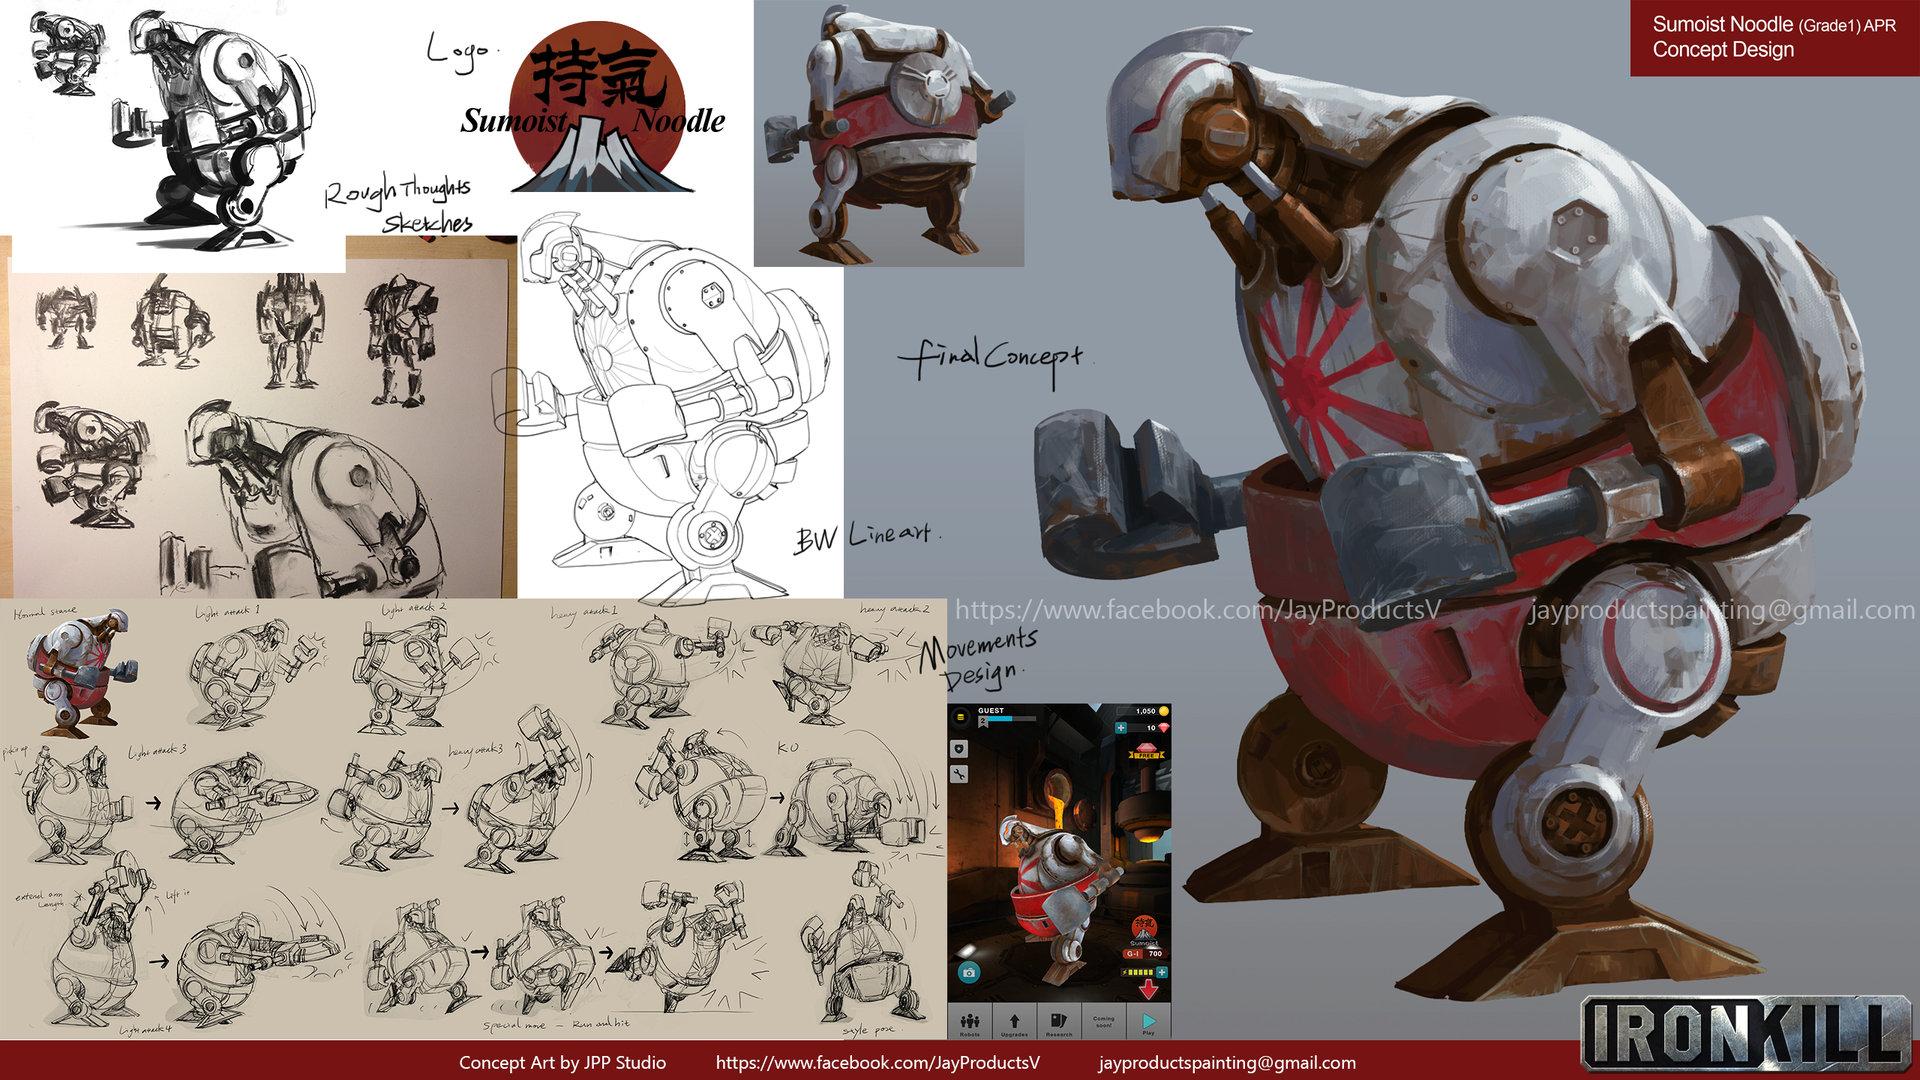 Game Character Design Apps : Artstation ironkill app game concept artwork robot sumoist